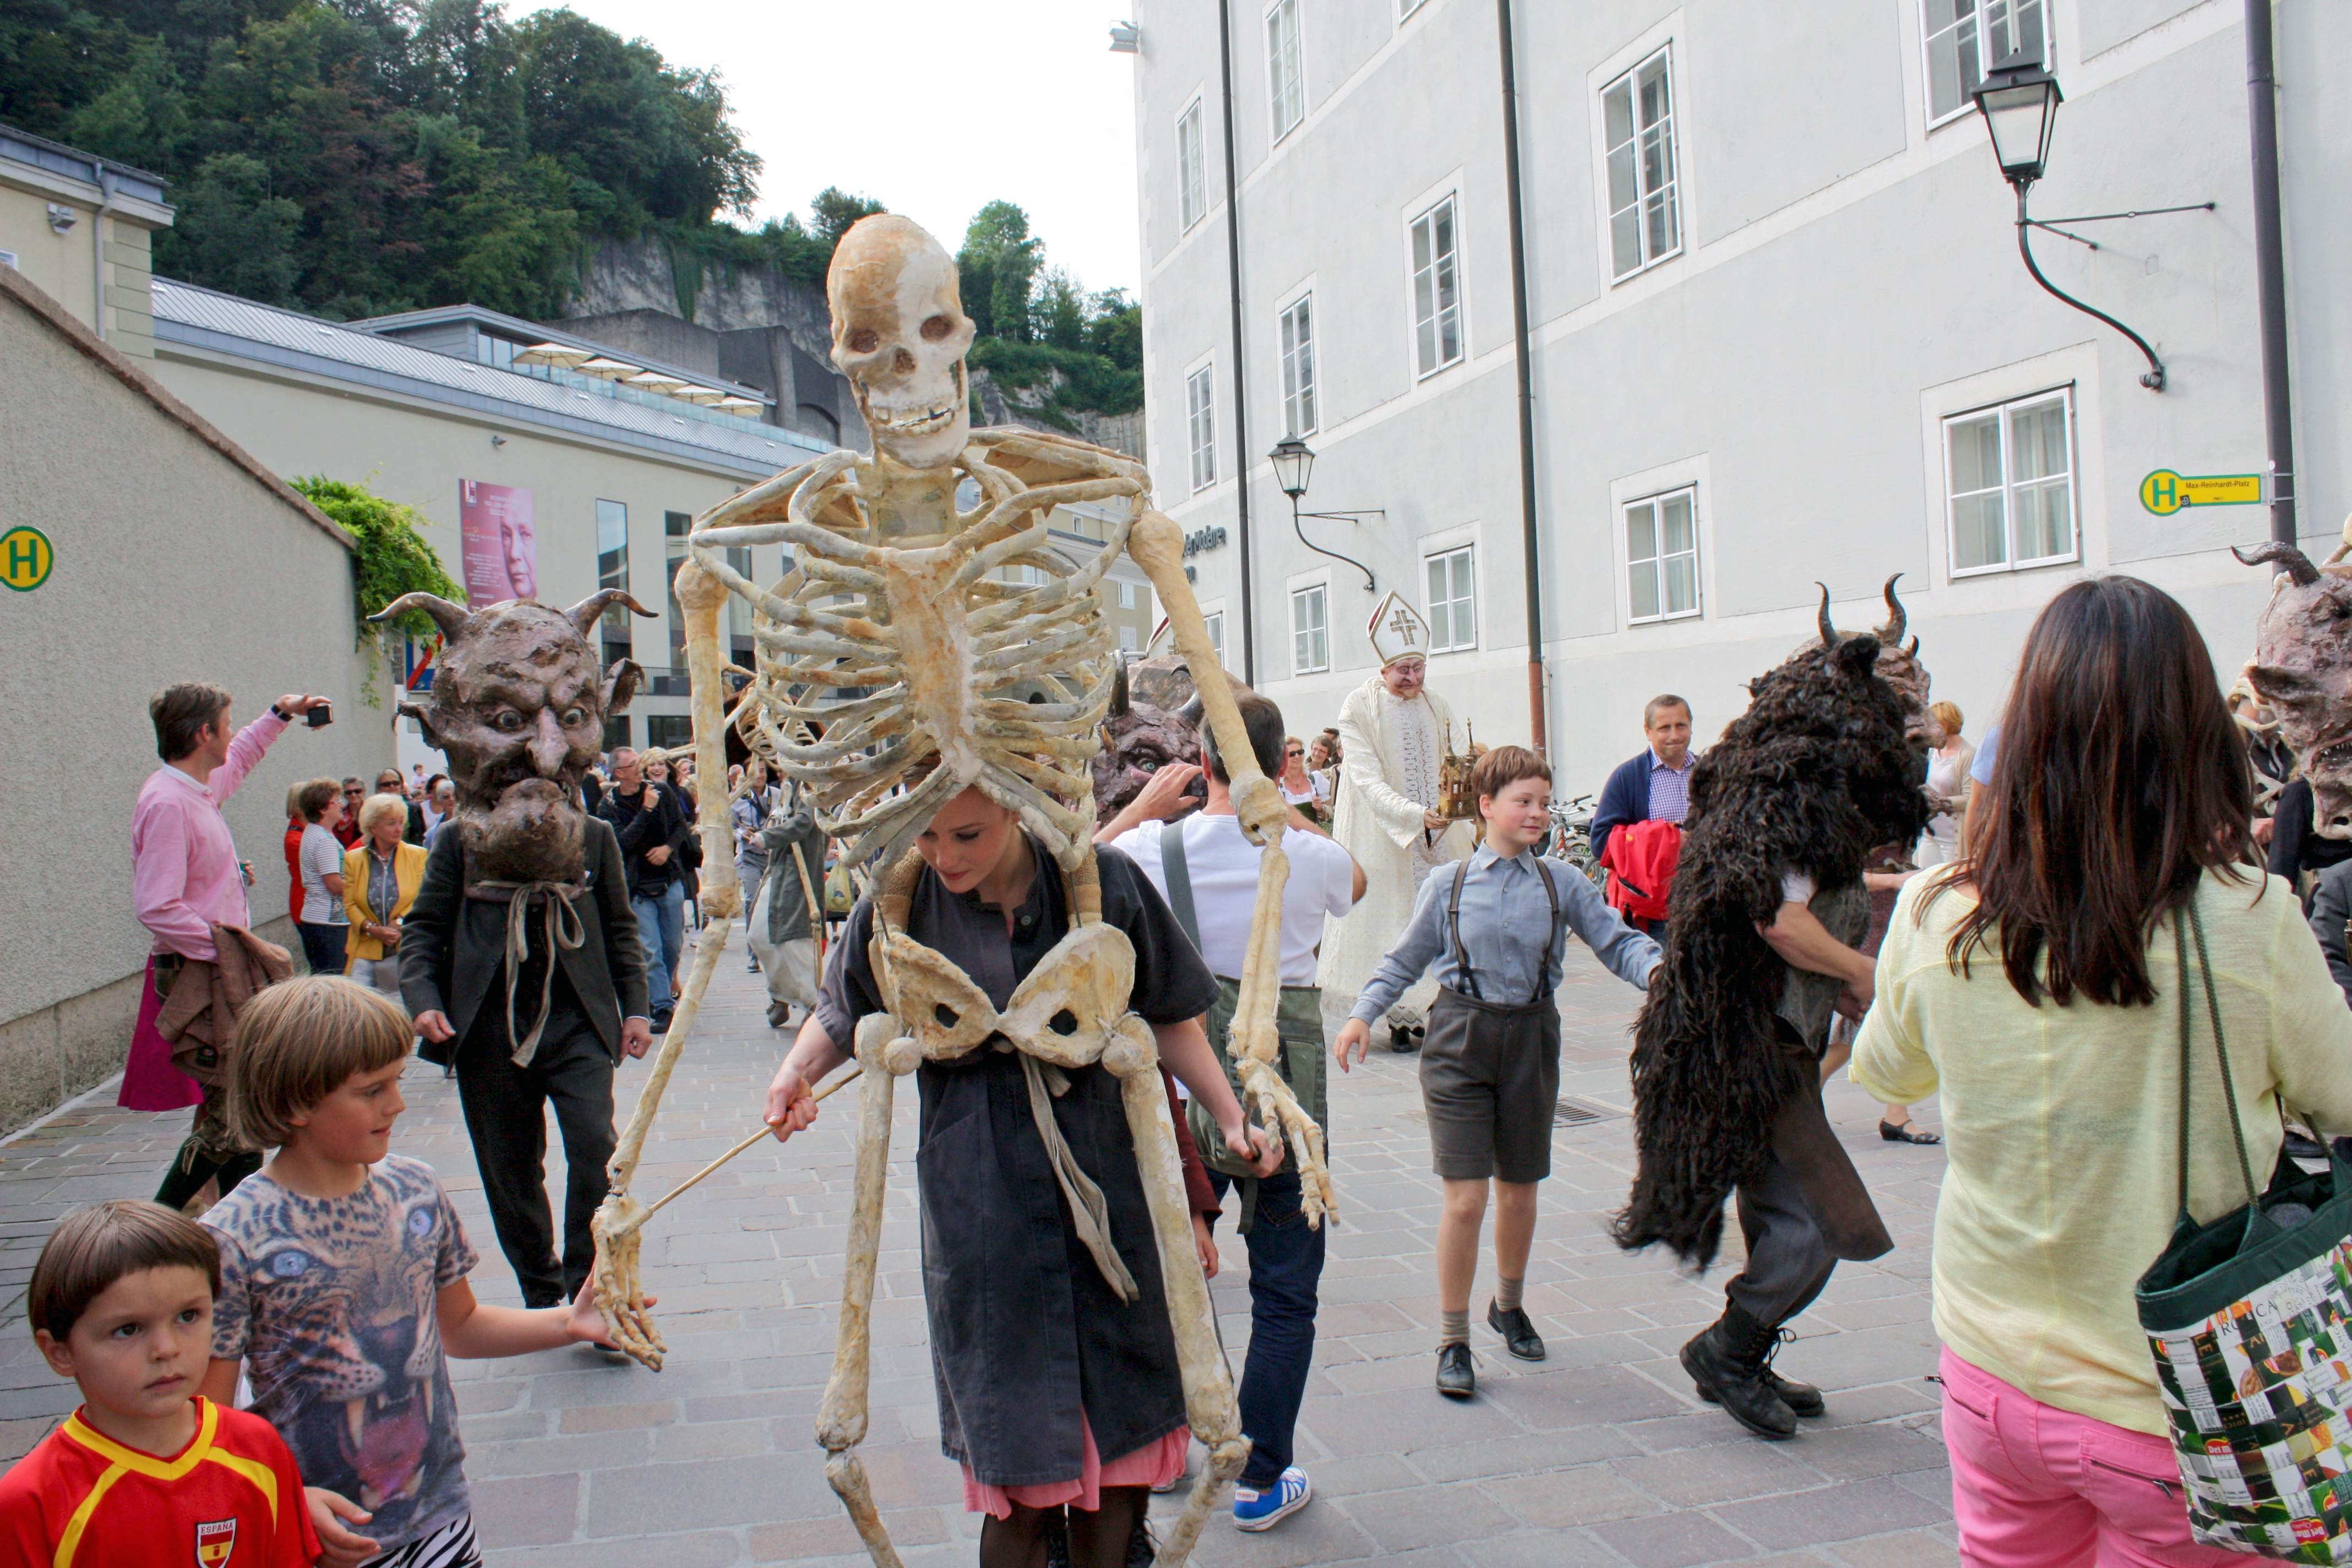 Music Festival parade, Salzburg